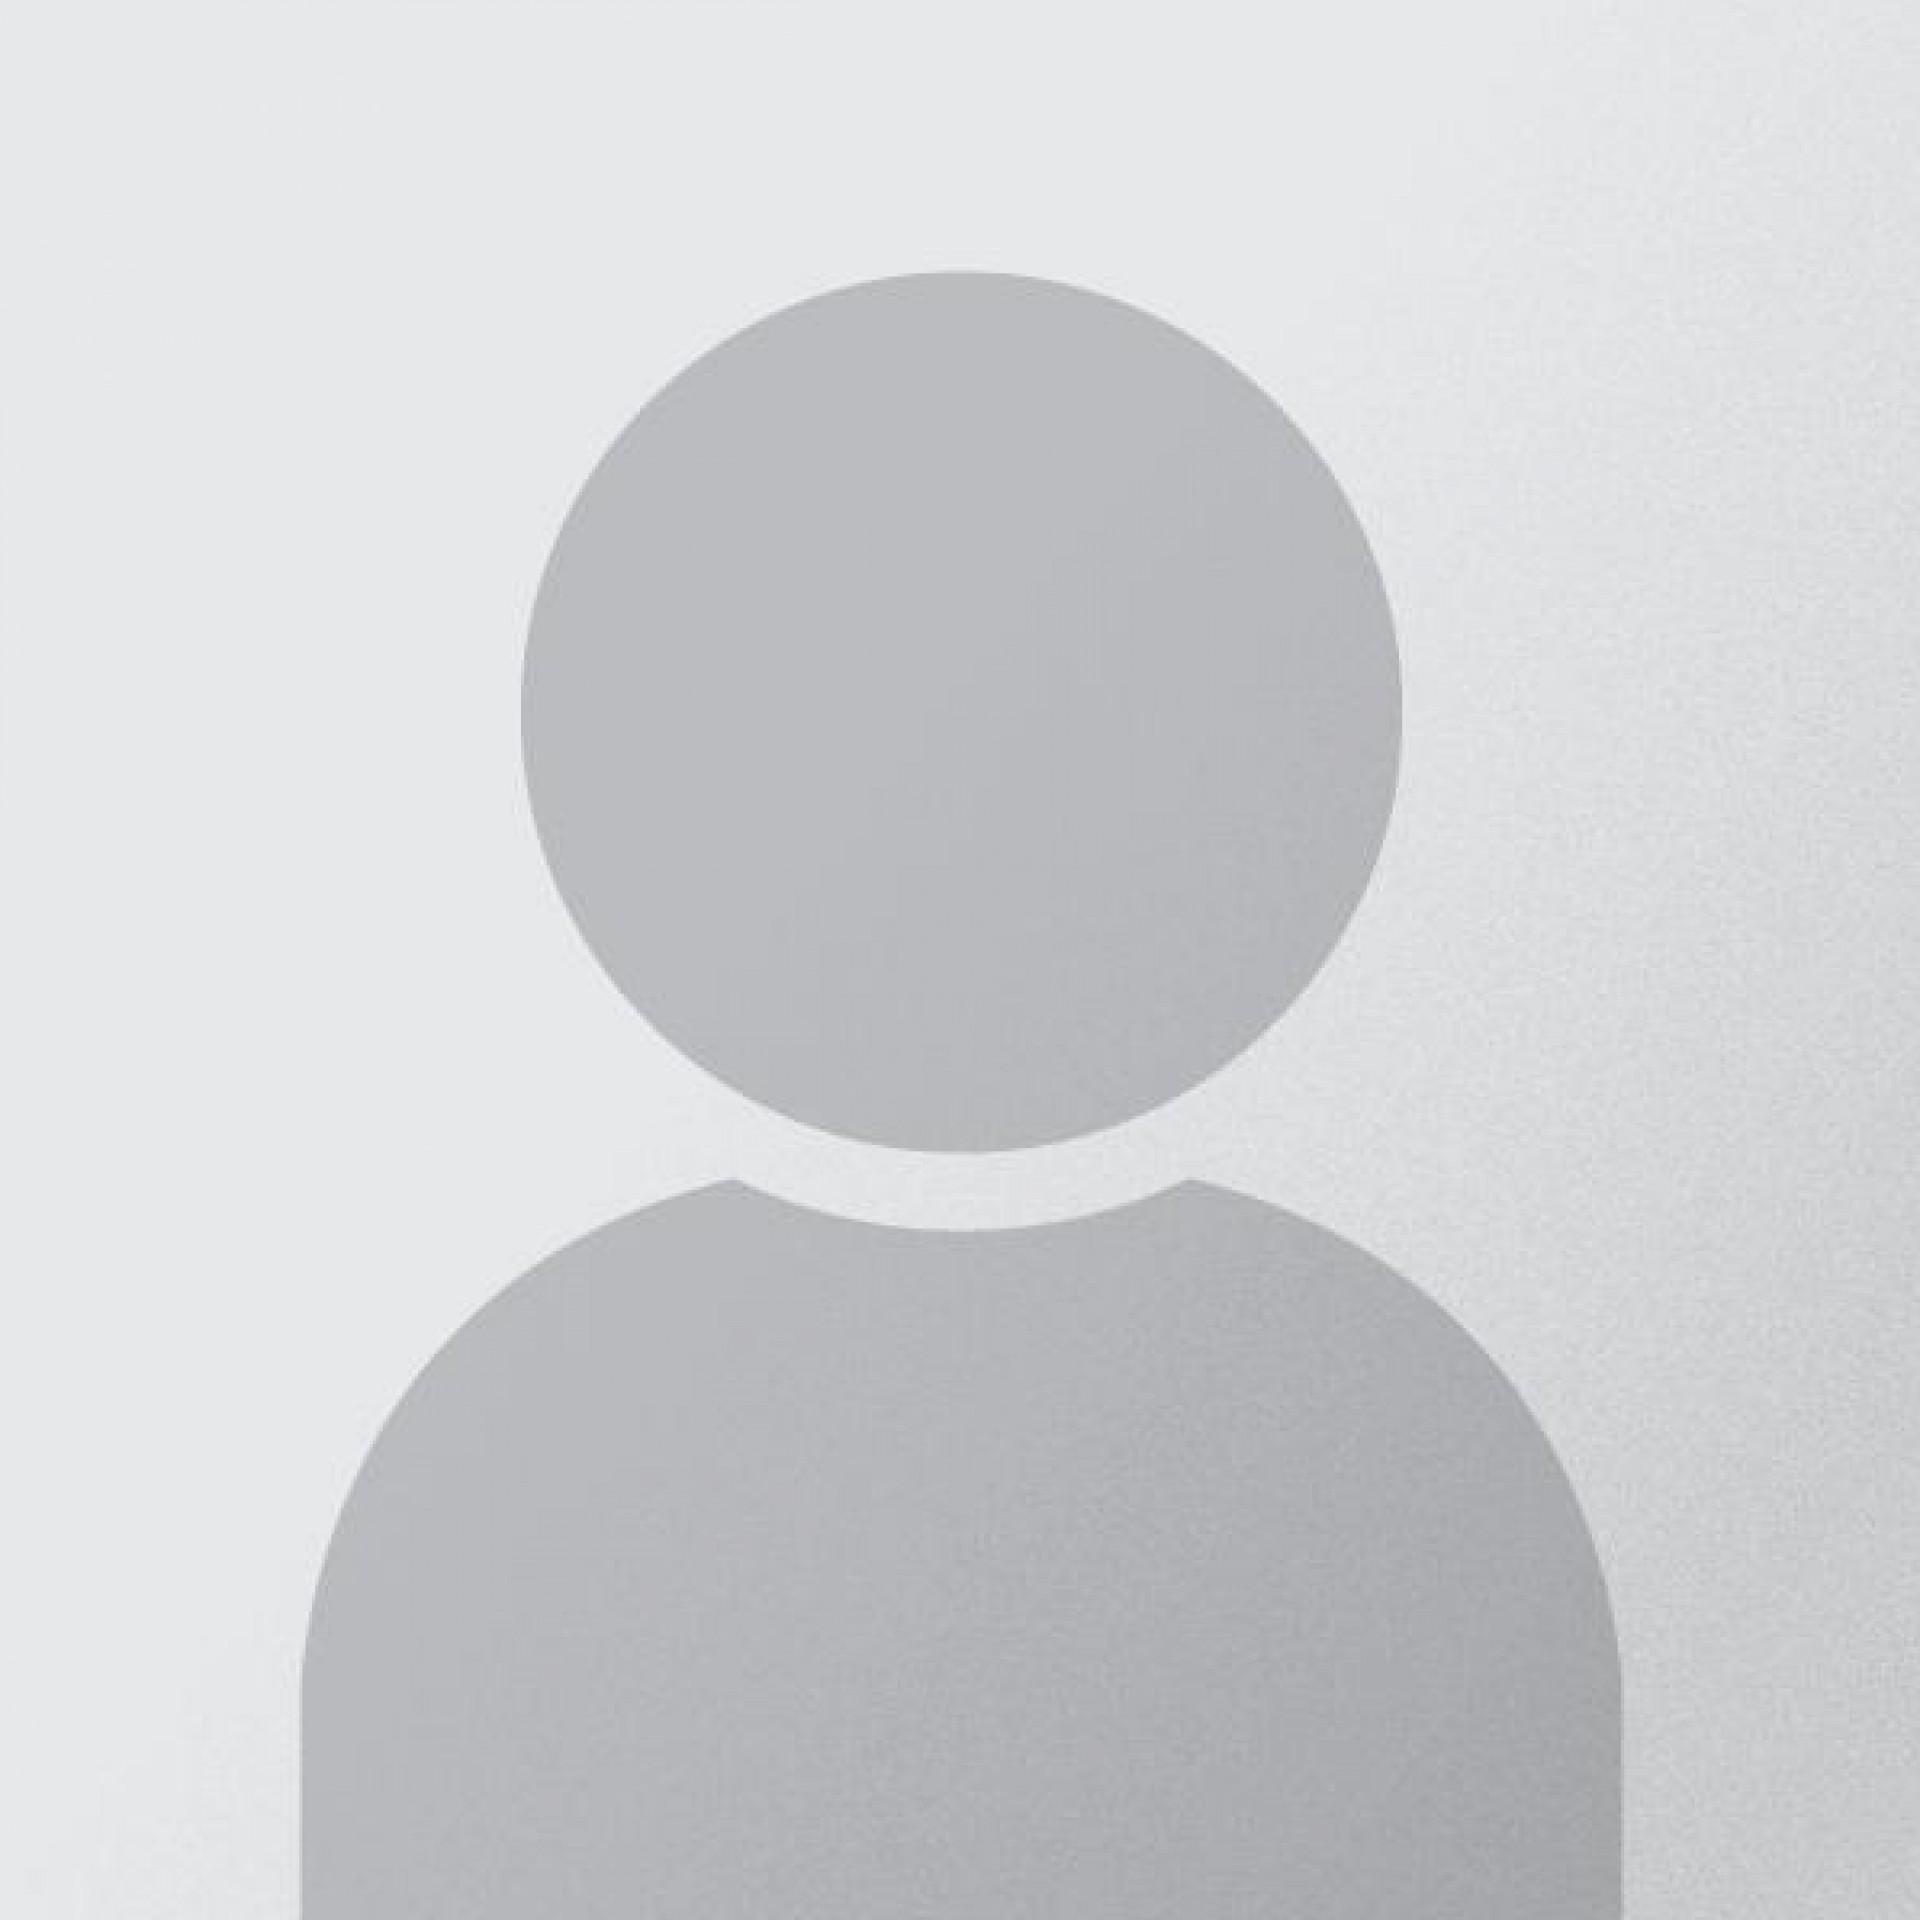 fotografia p021 profilu 01021DH6L8